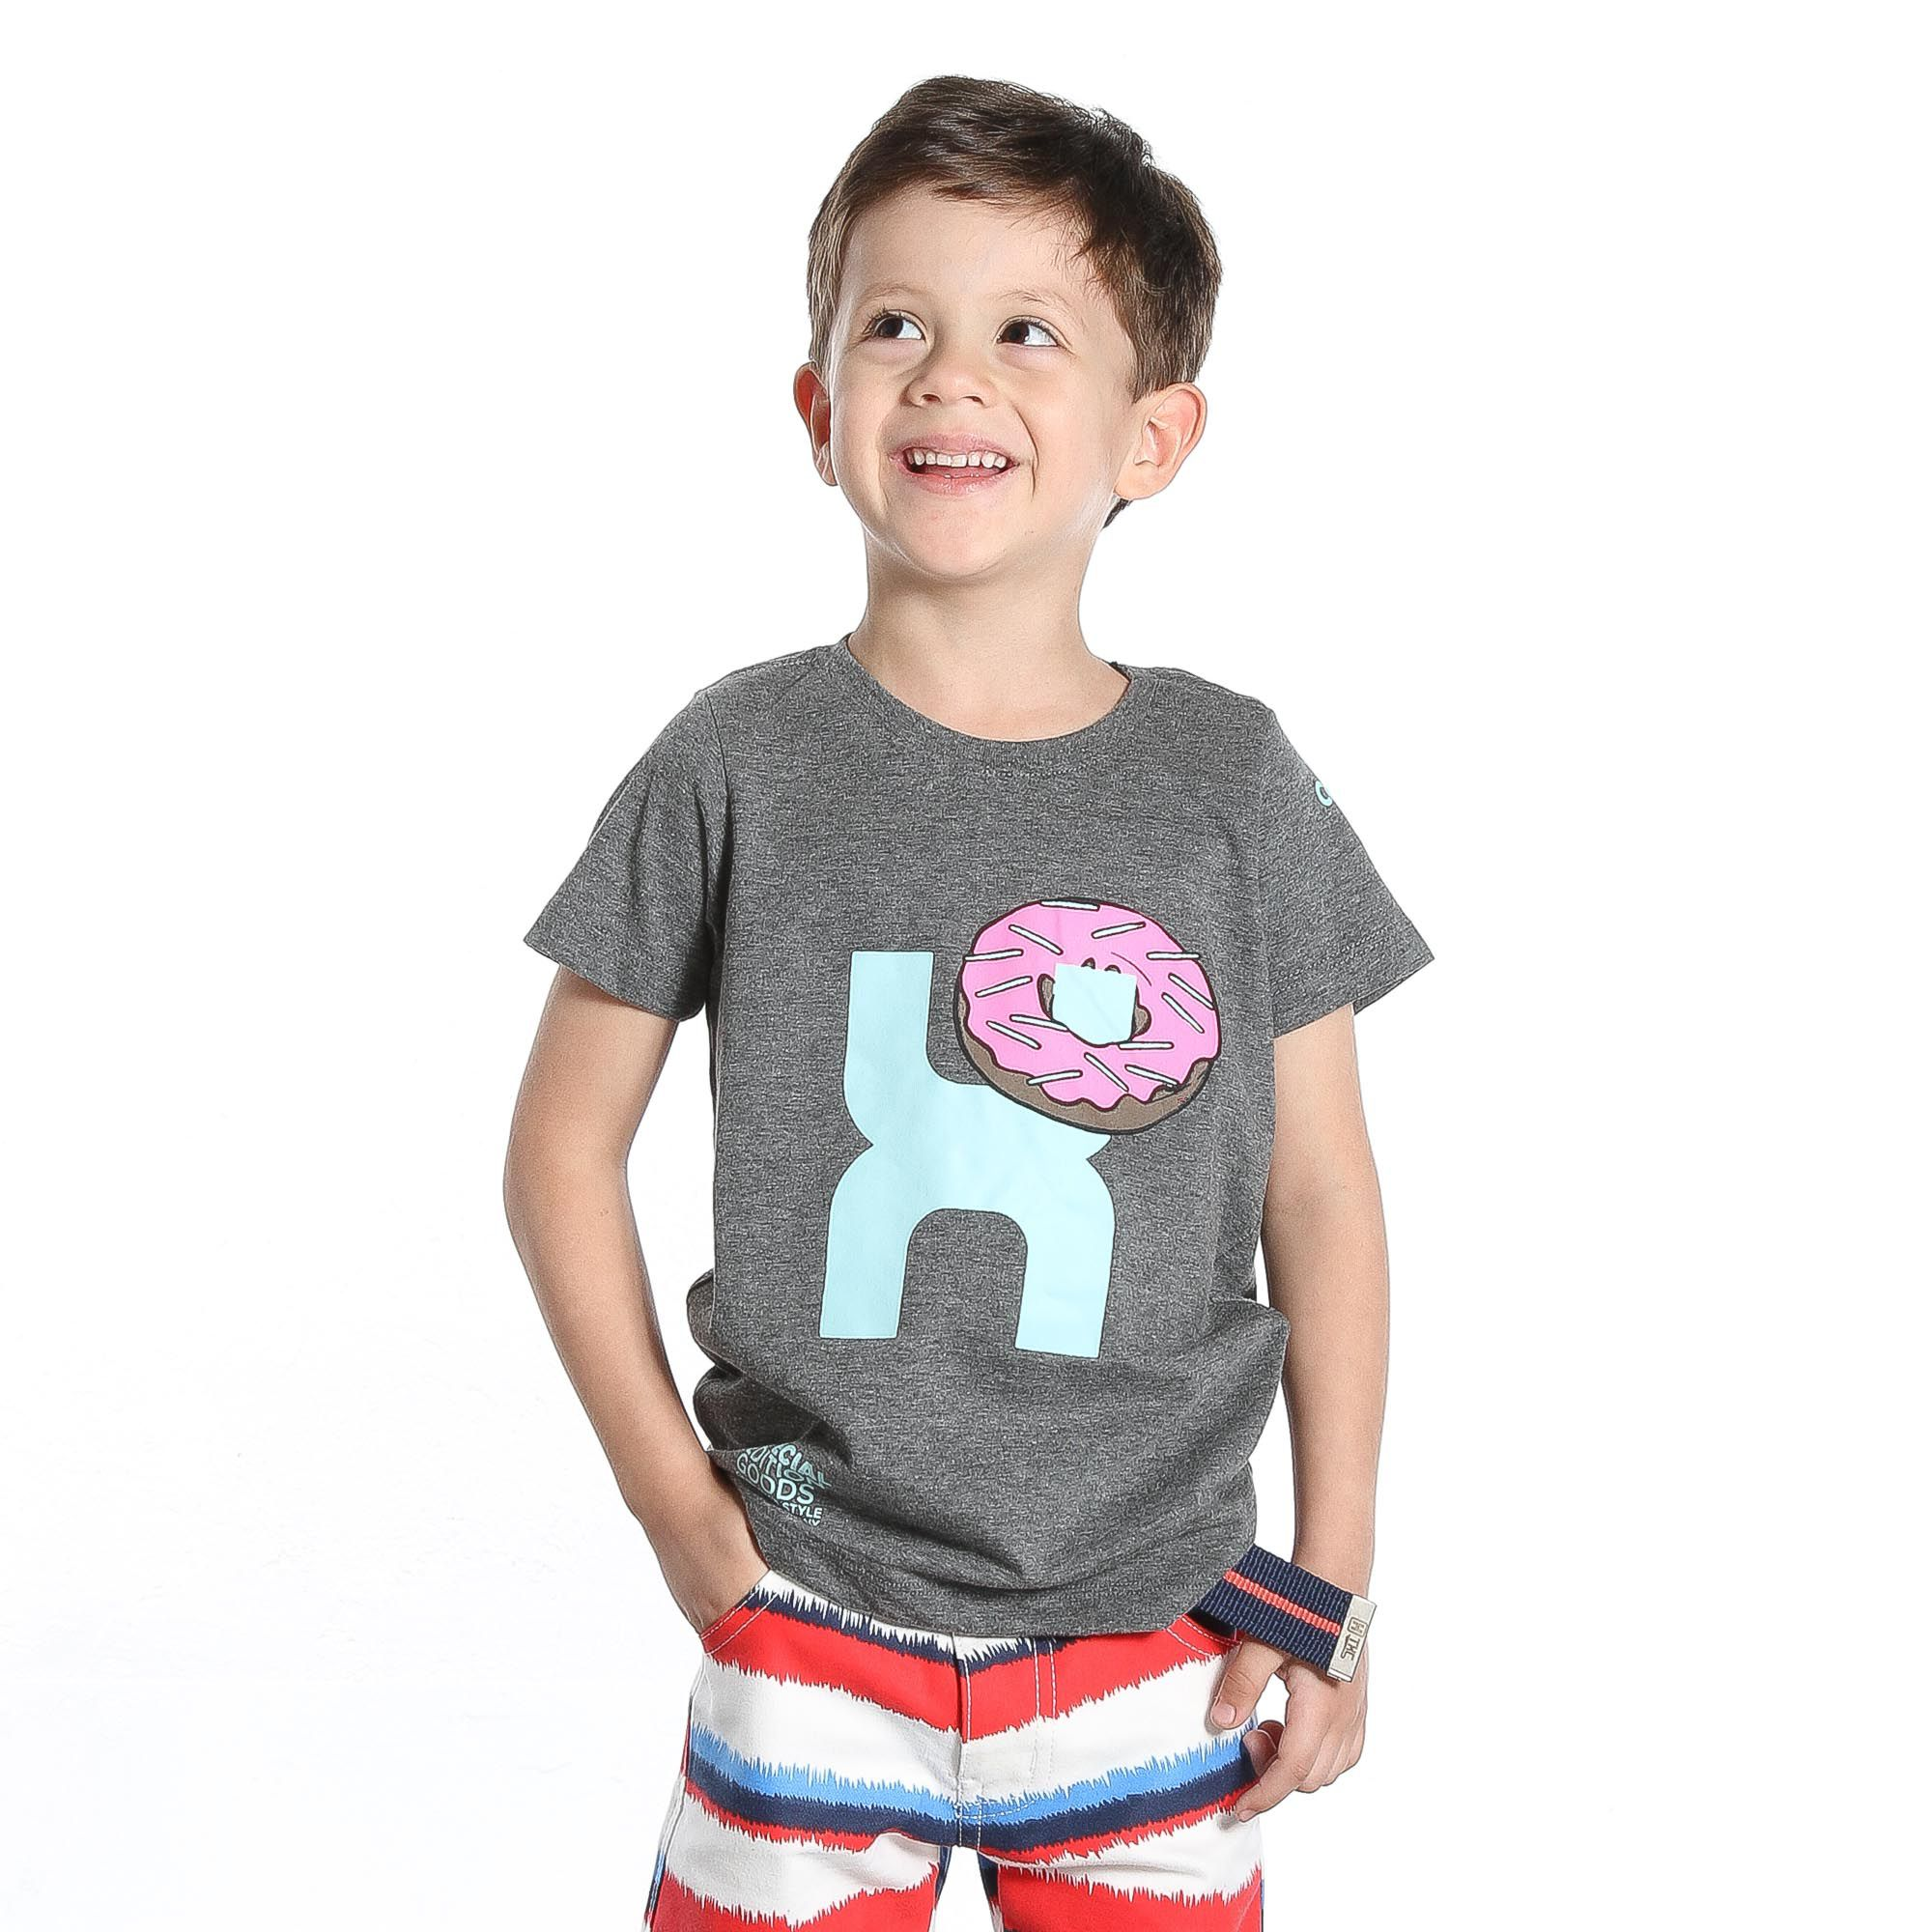 Camiseta infantil TXC 14043I